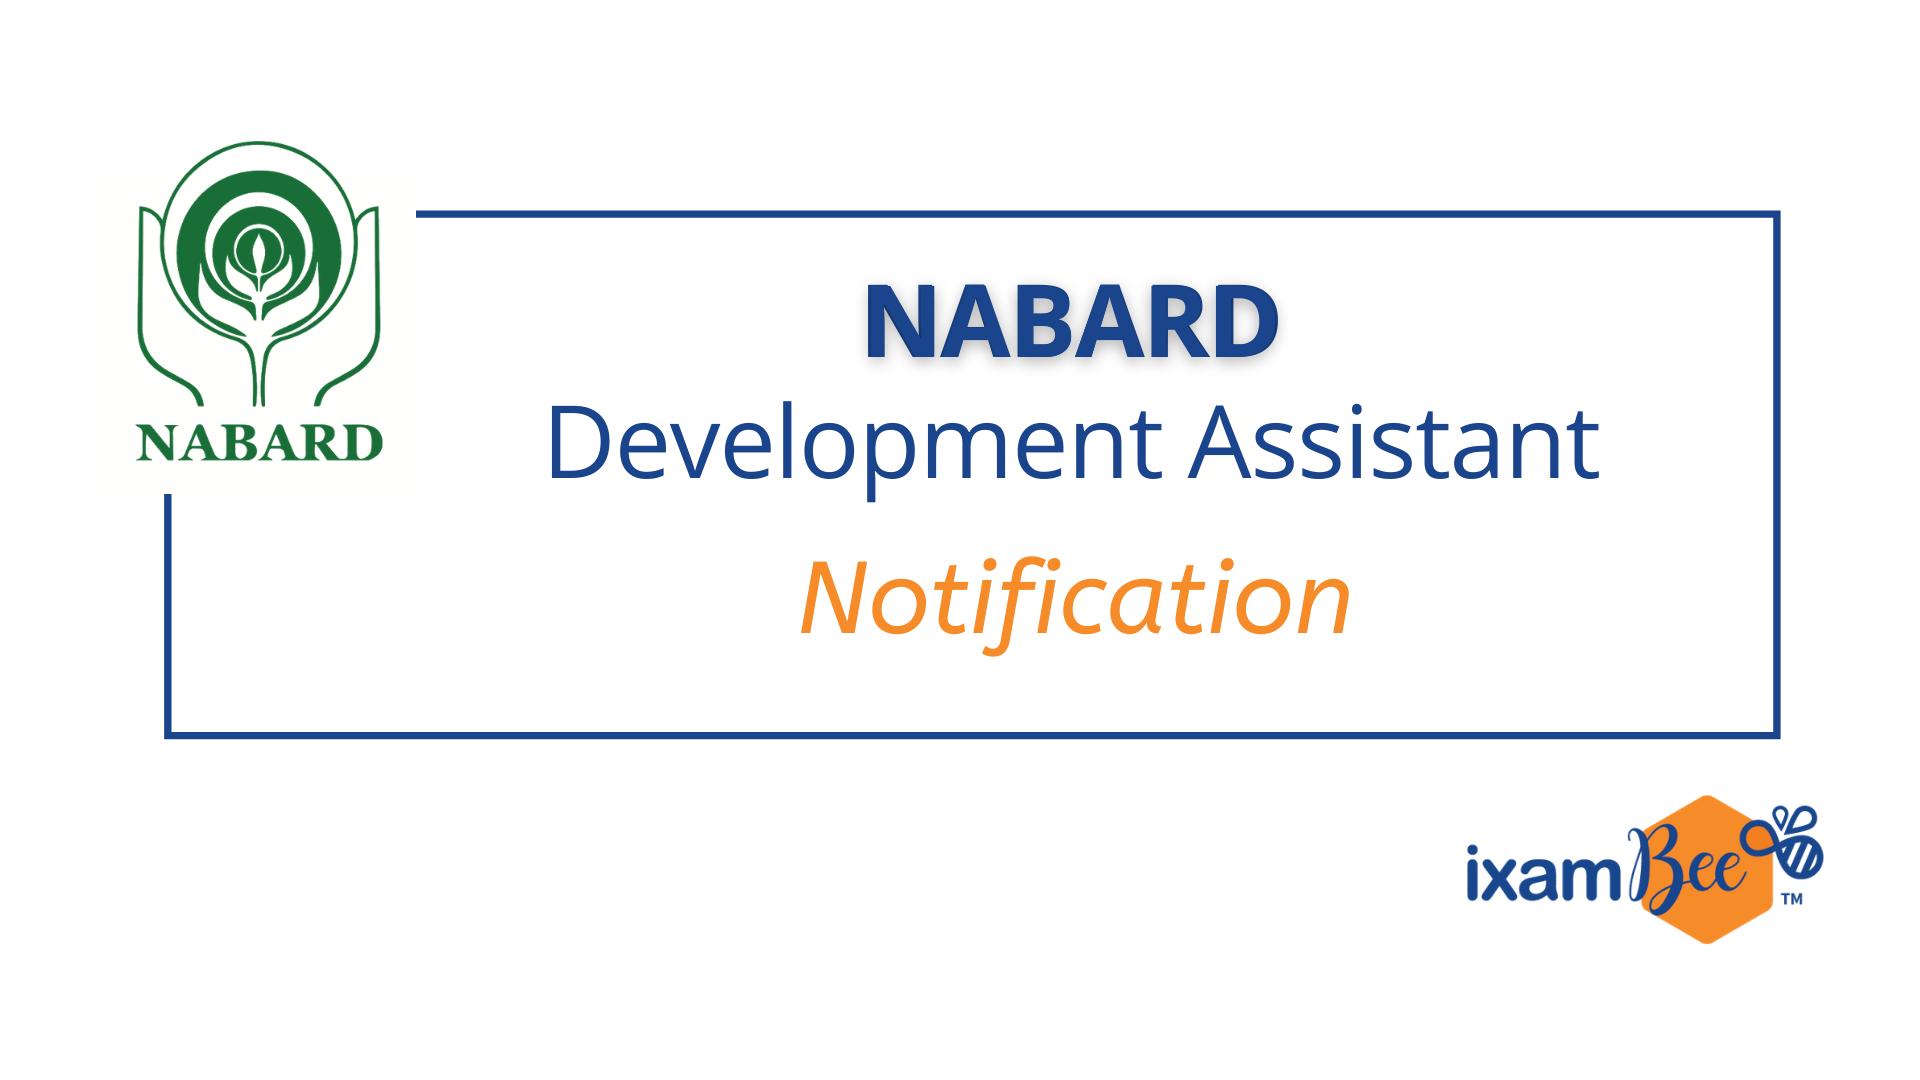 NABARD Development Assistant Notification